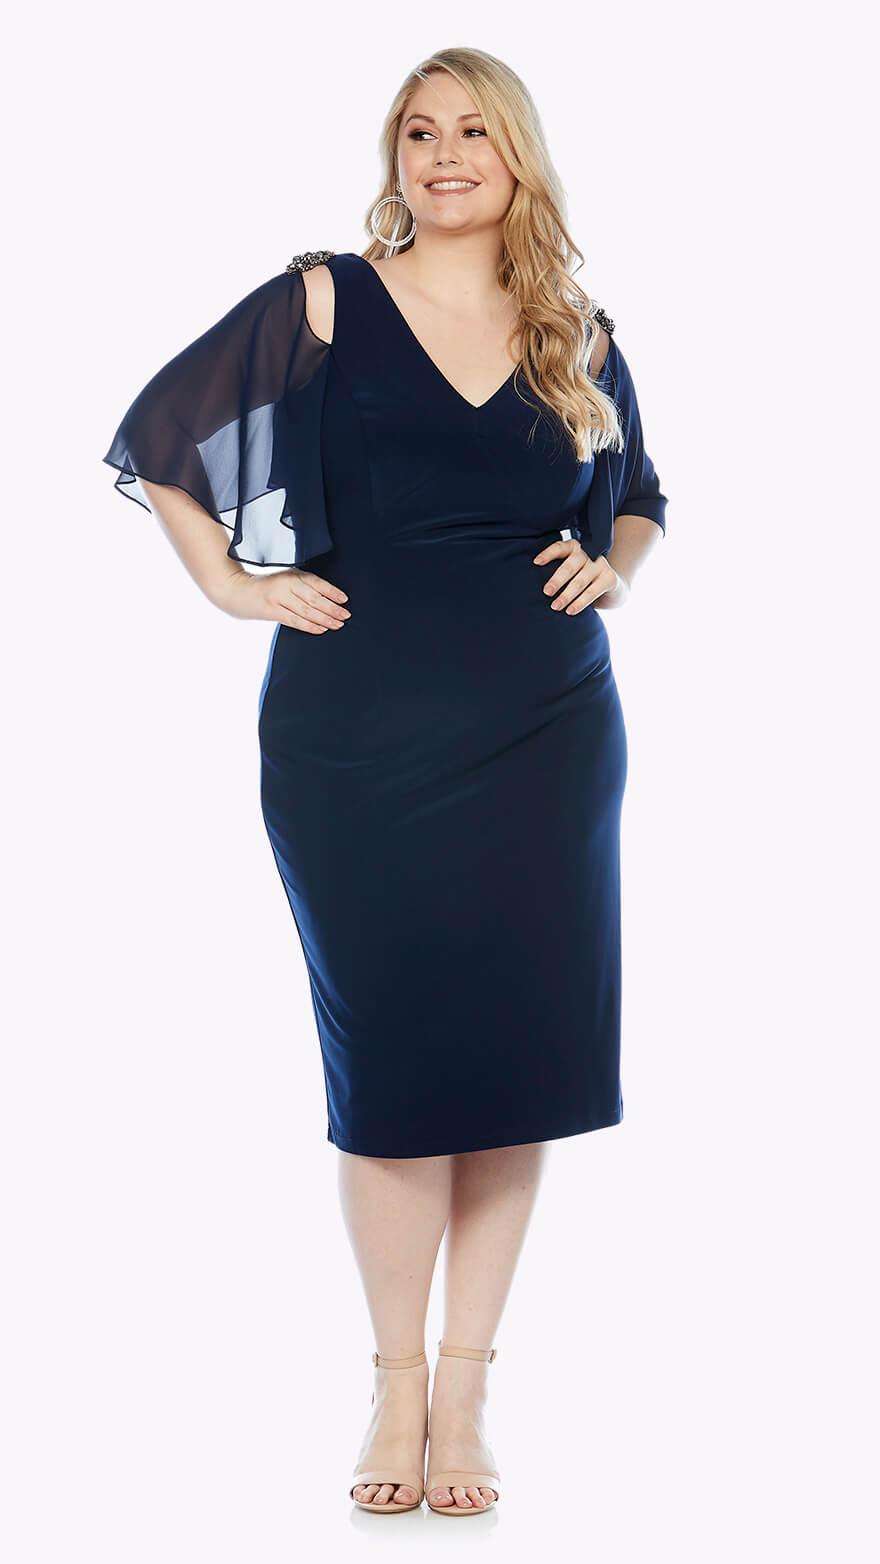 LJ0142 Knee-length stretch dress with flounced chiffon sleeve and diamanté shoulder trim